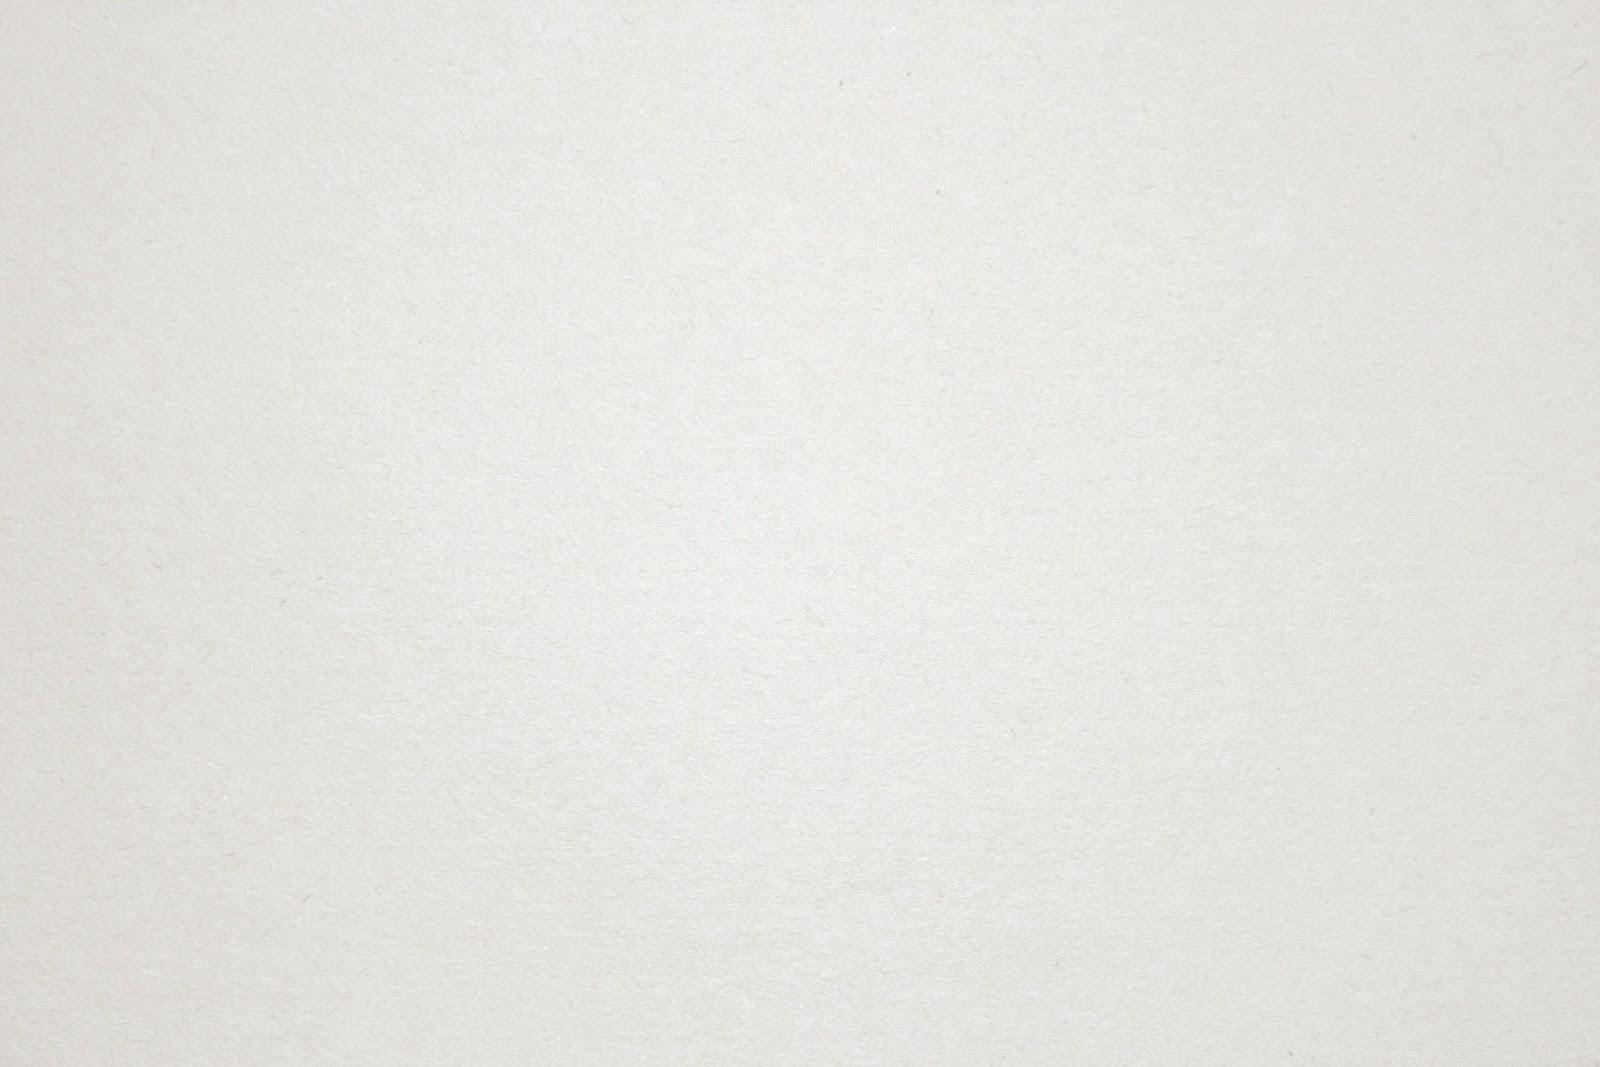 Blank Sheet of Paper!